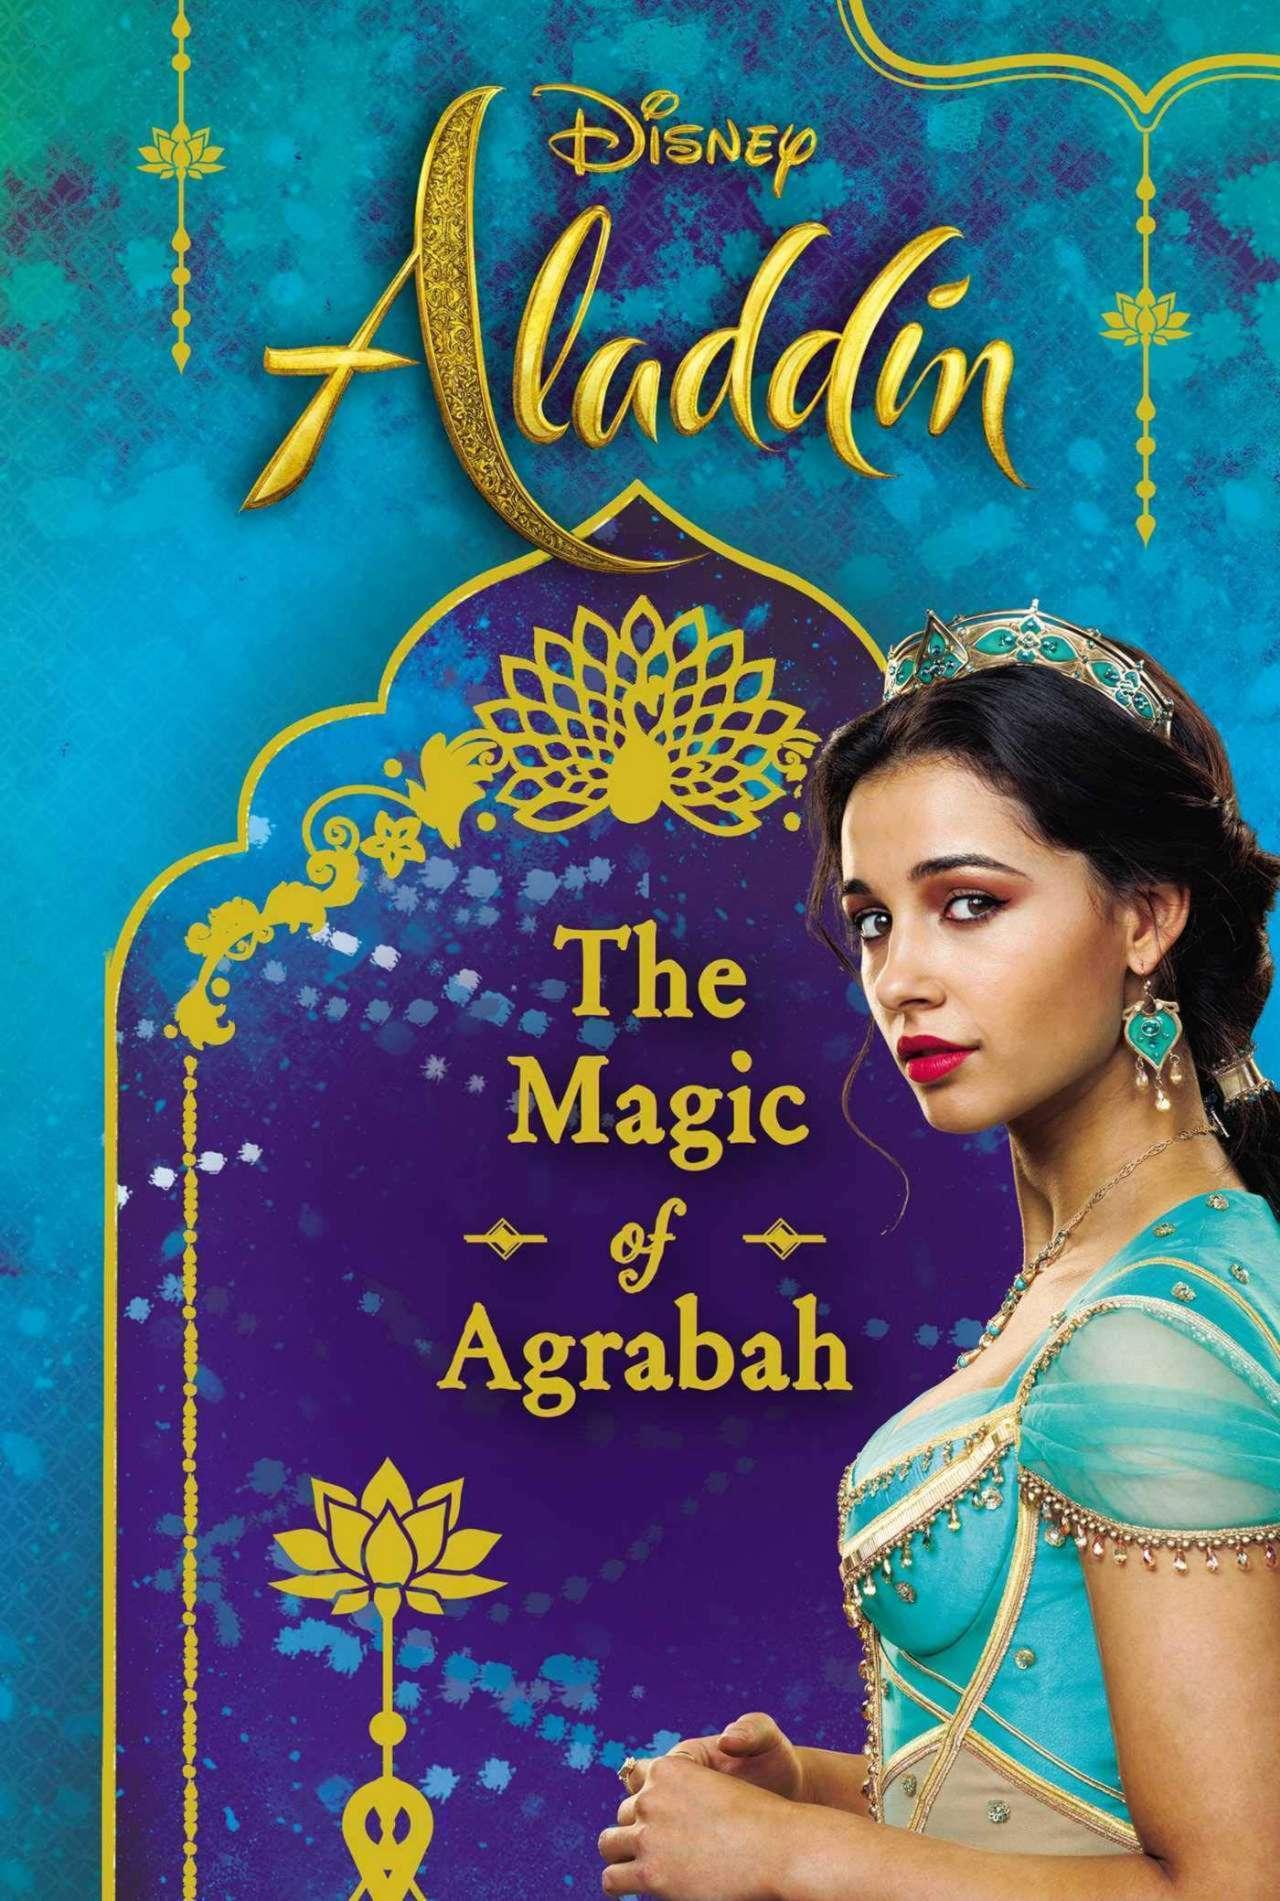 Aladdin Disney Reveals New Jasmine Image